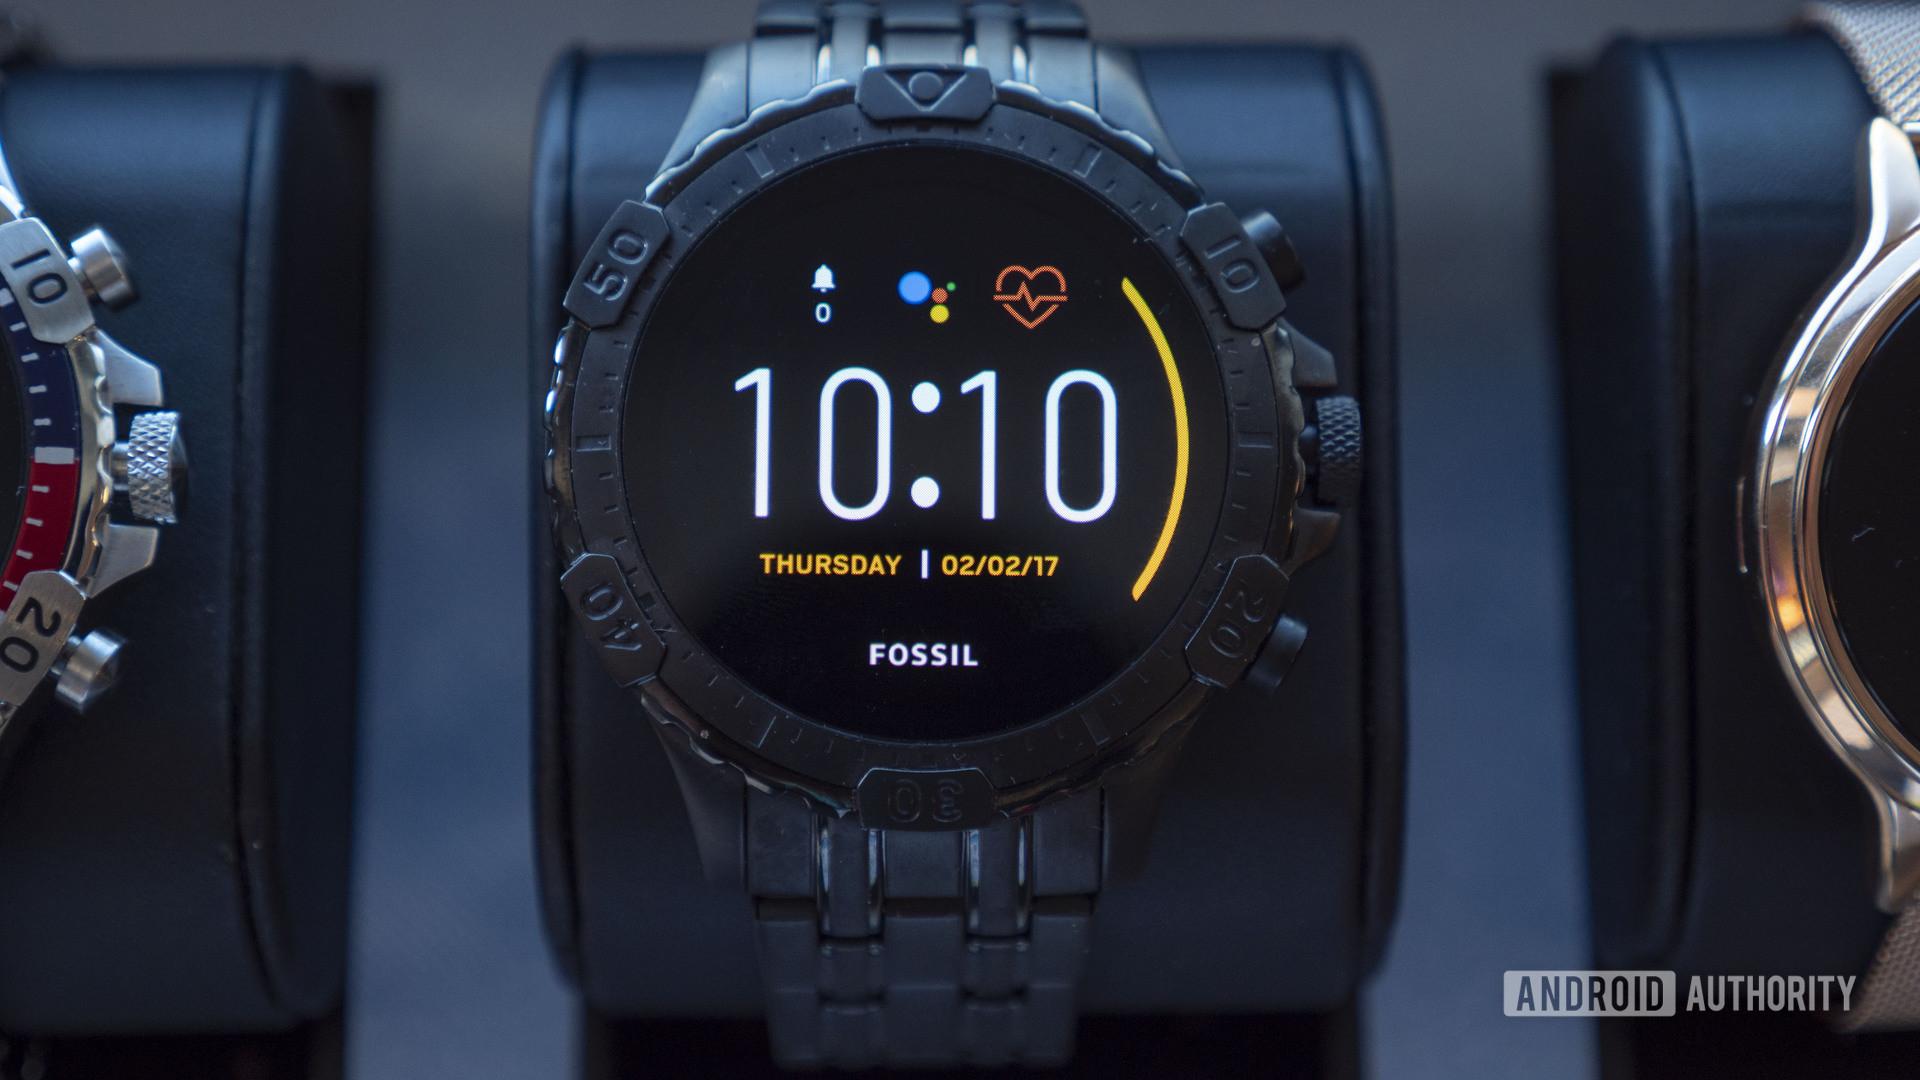 fossil gen 5 smartwatch garrett 3